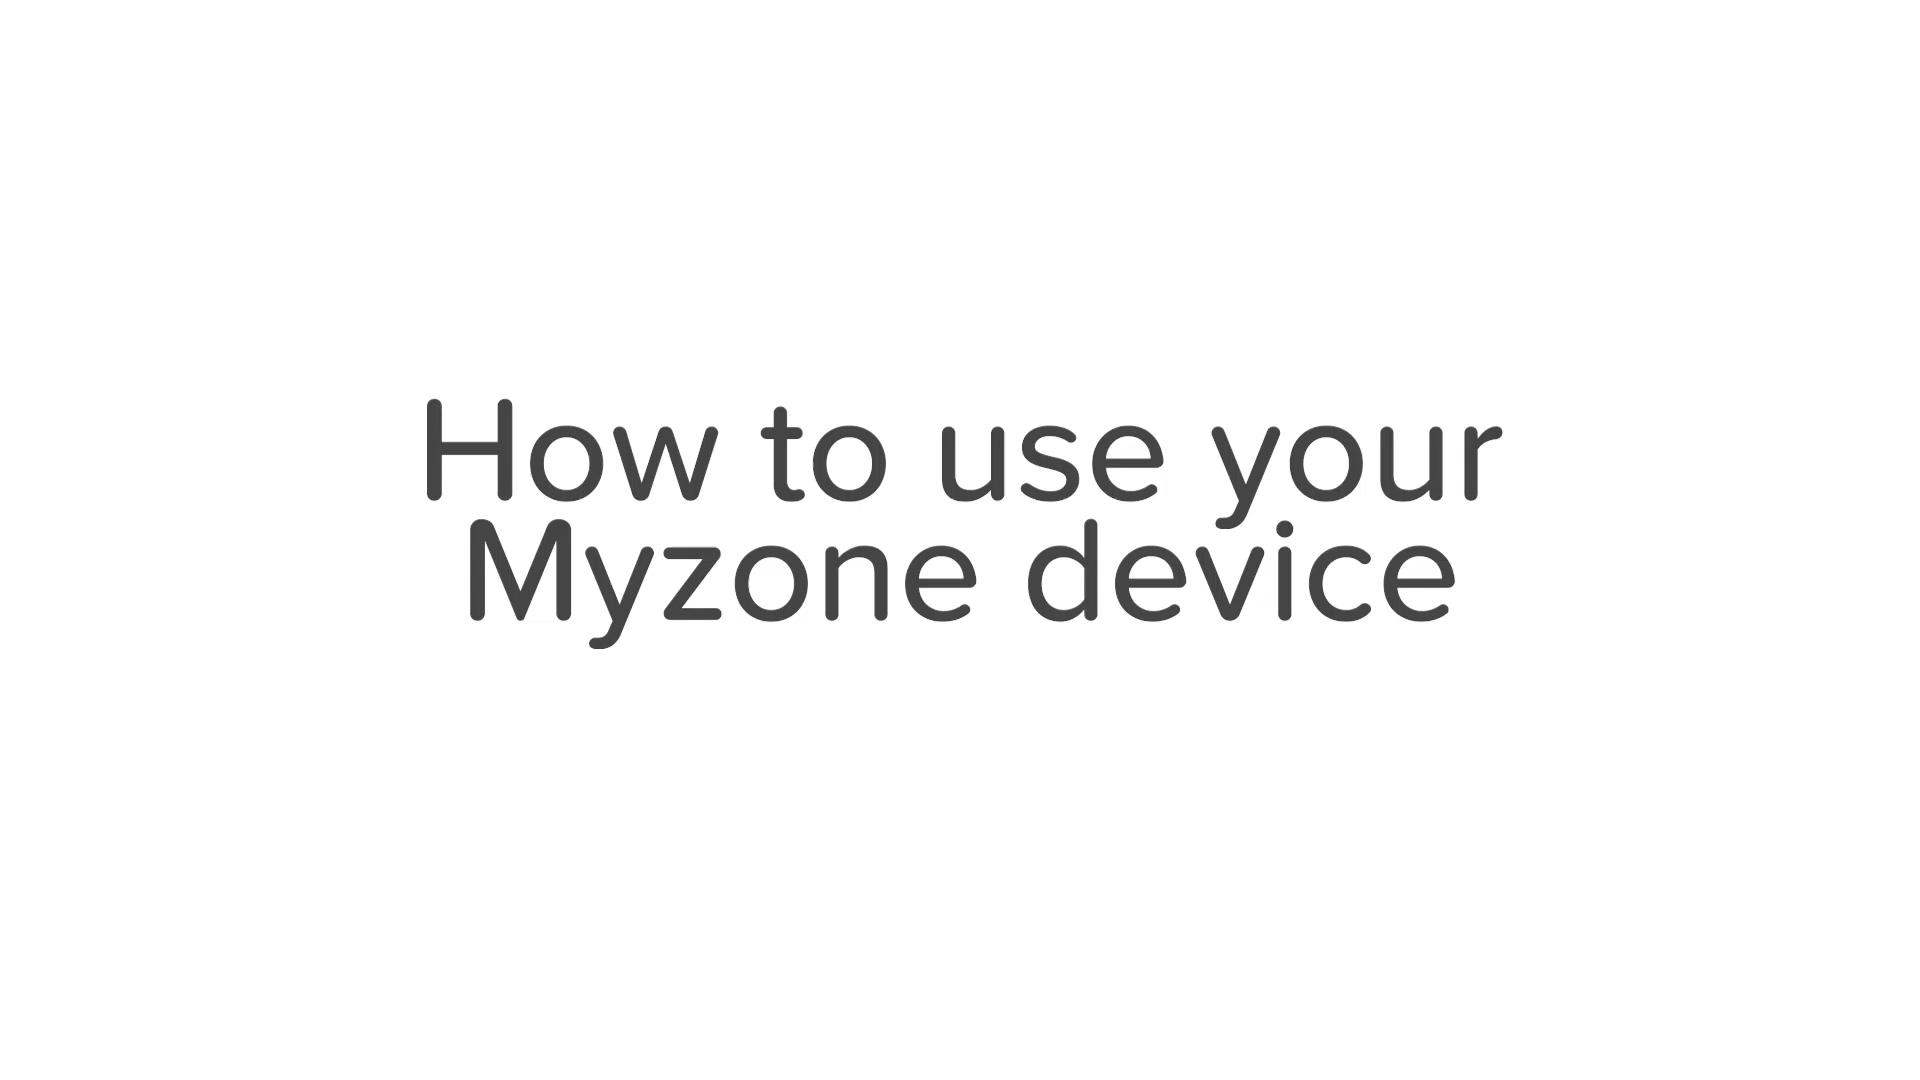 Myzone - Customer Setup and Use